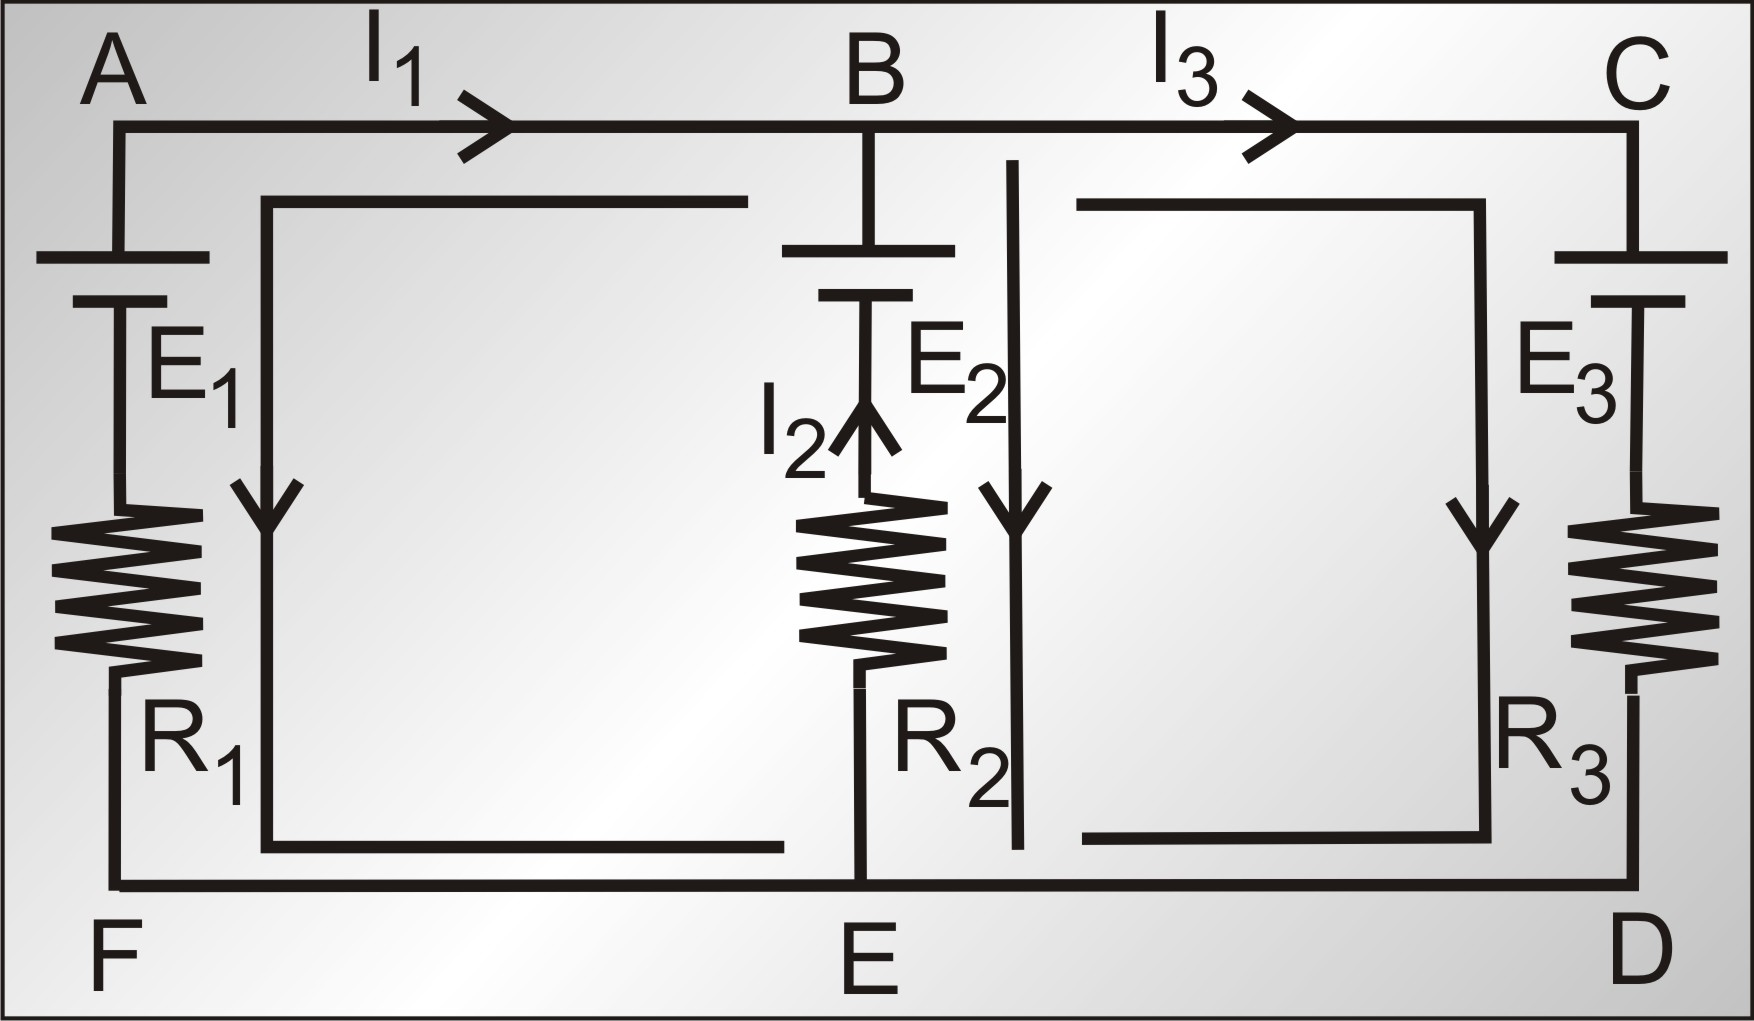 Contoh Makalah Fisika Rangkaian Arus Searah Belajar Online Un Dan Sbmptn Quipper Video Penyelesaian Rangkaian Dua Loop Dengan Hukum Kirchoff Dan Tegangan